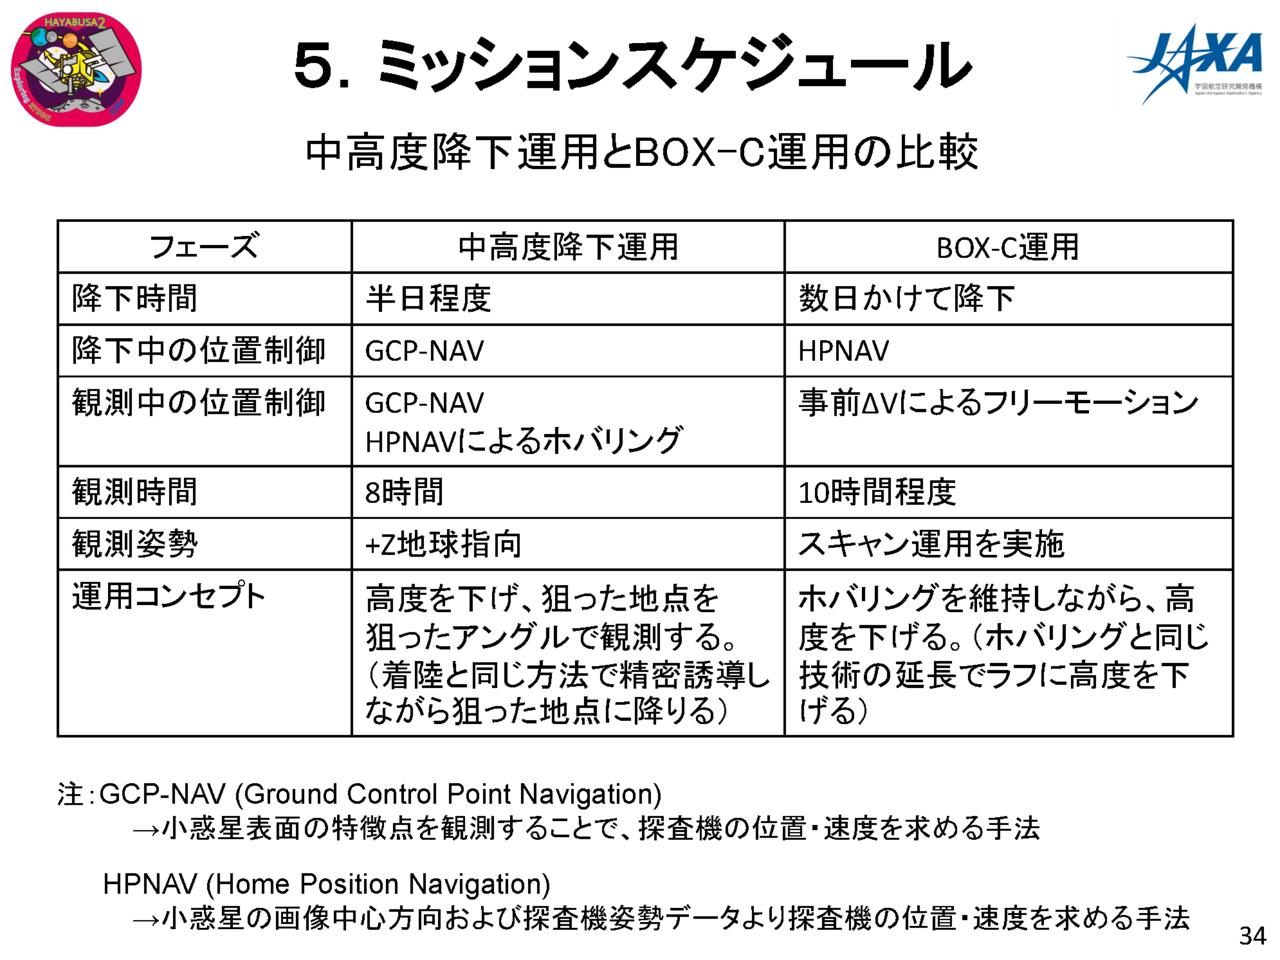 f:id:Imamura:20180719131729p:plain